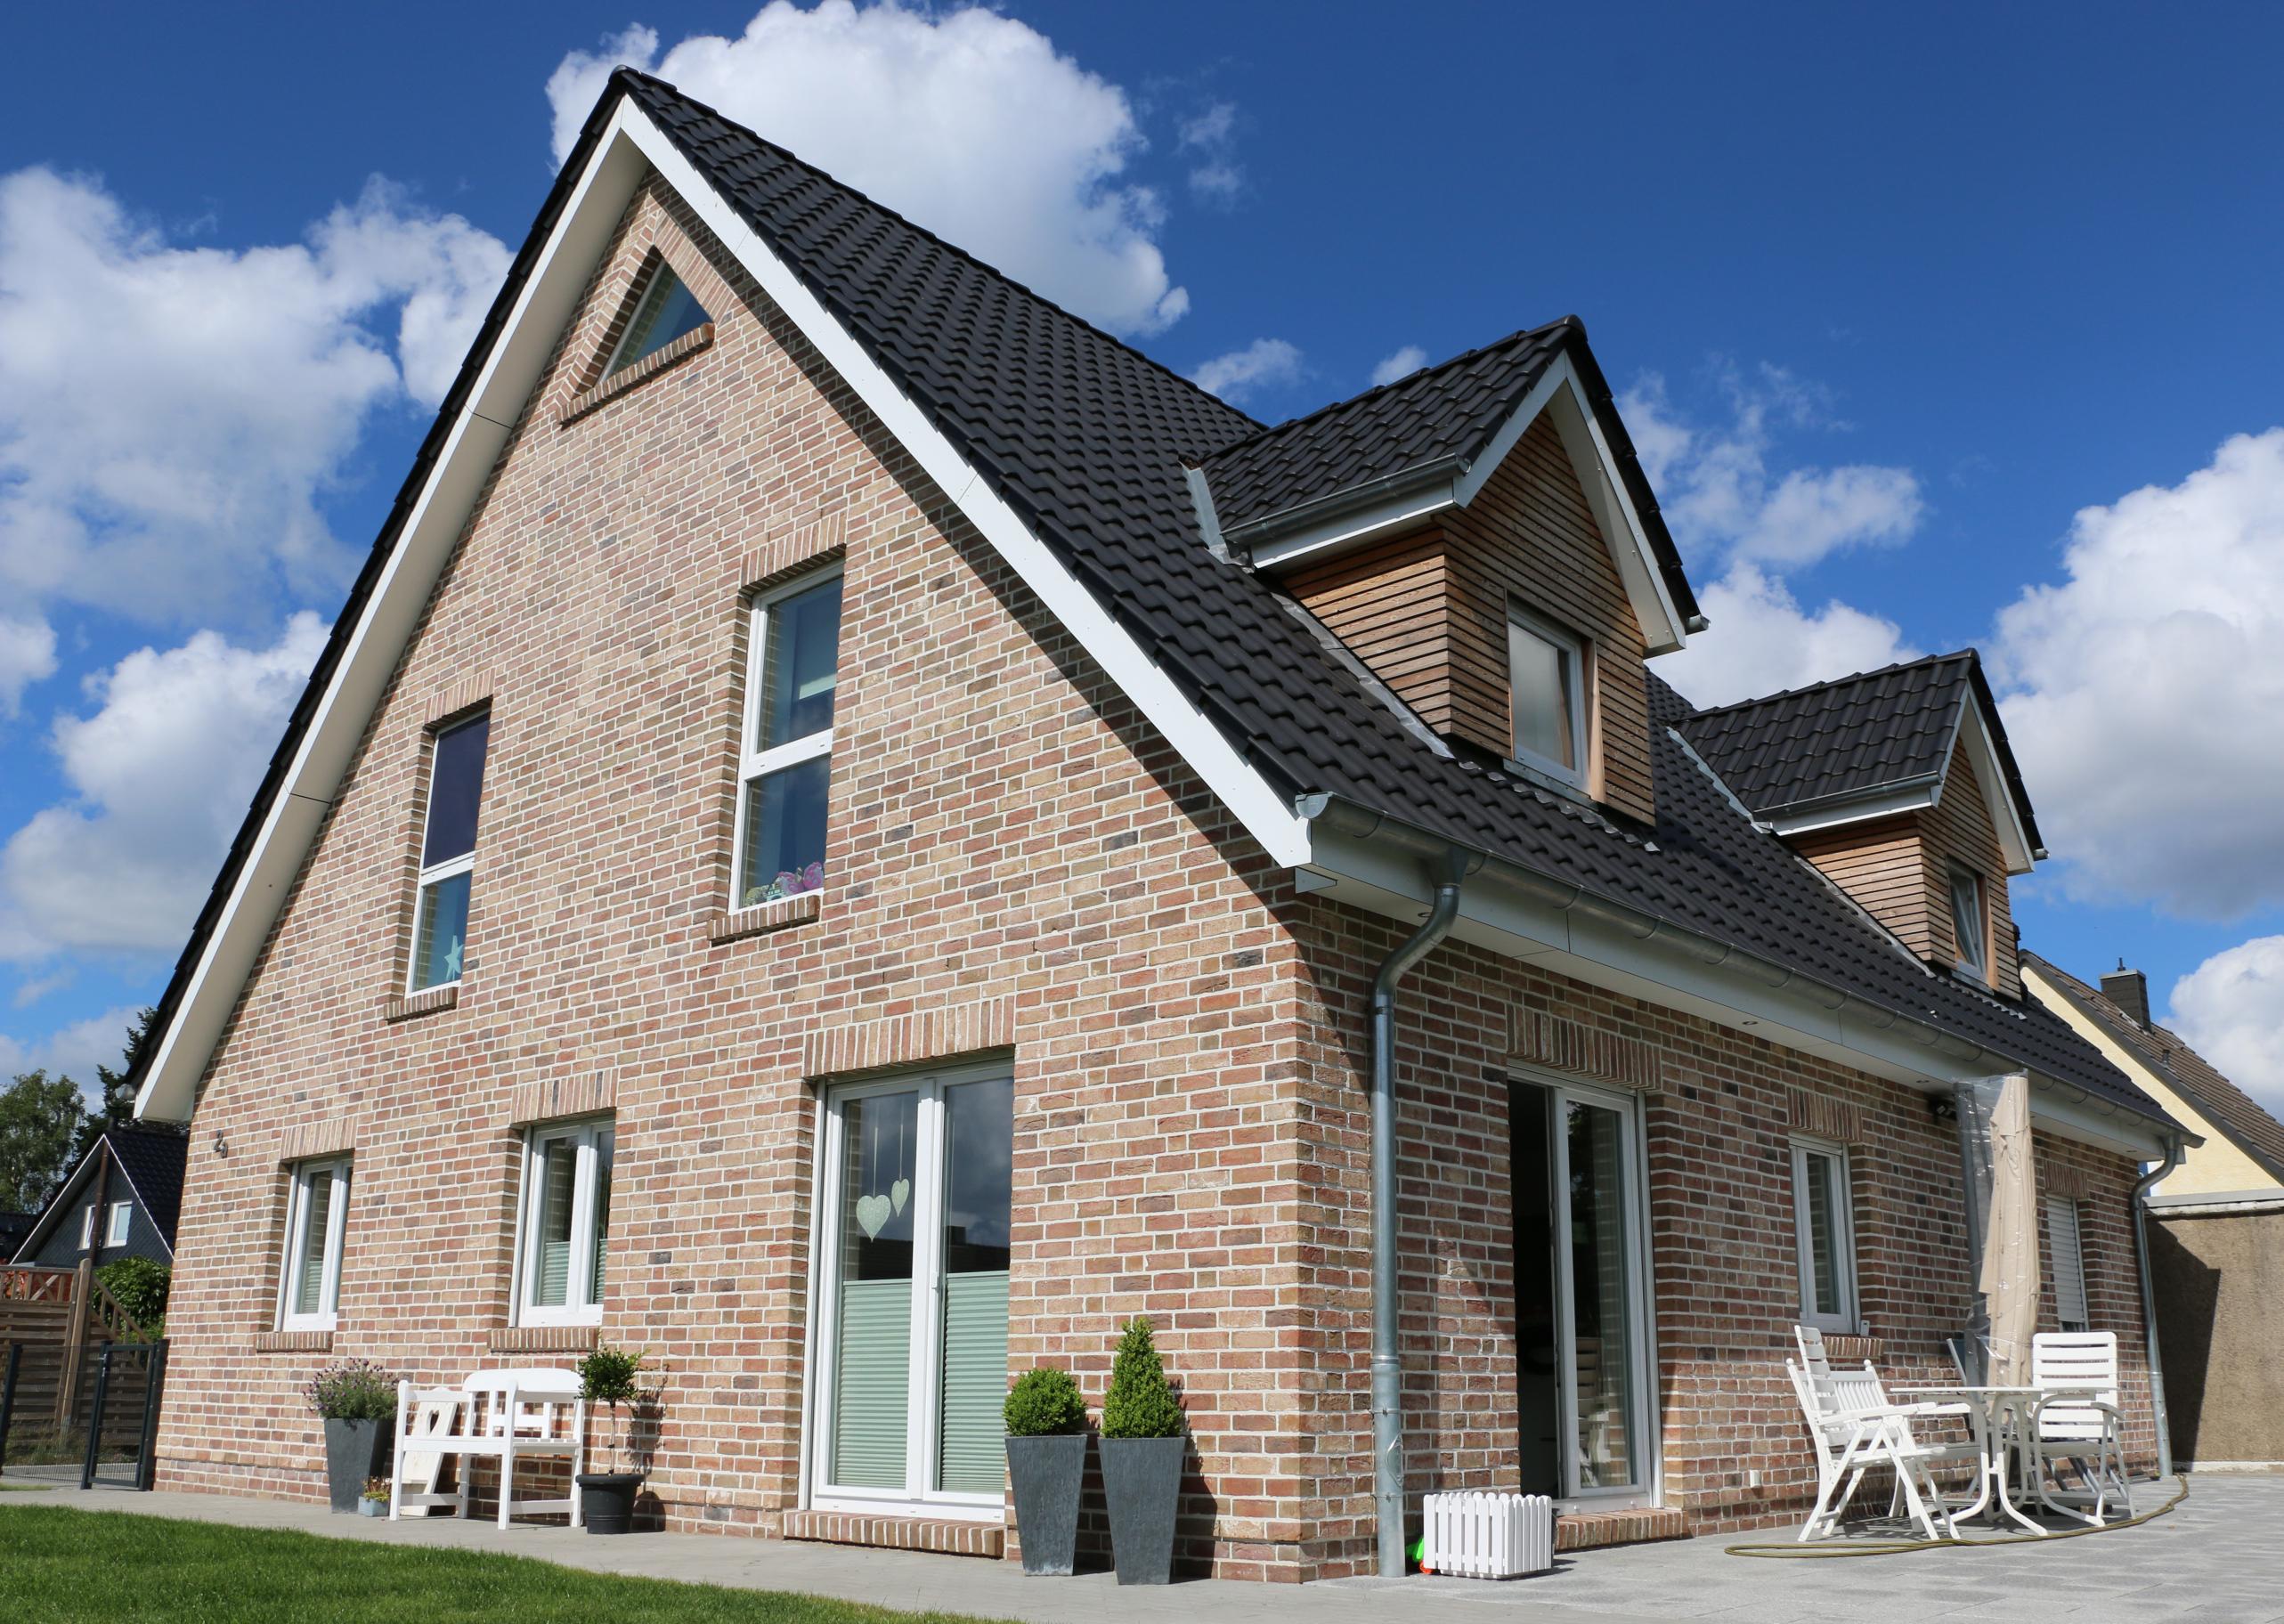 Neubau eines Einfamilienhauses  in Hamberge 2015